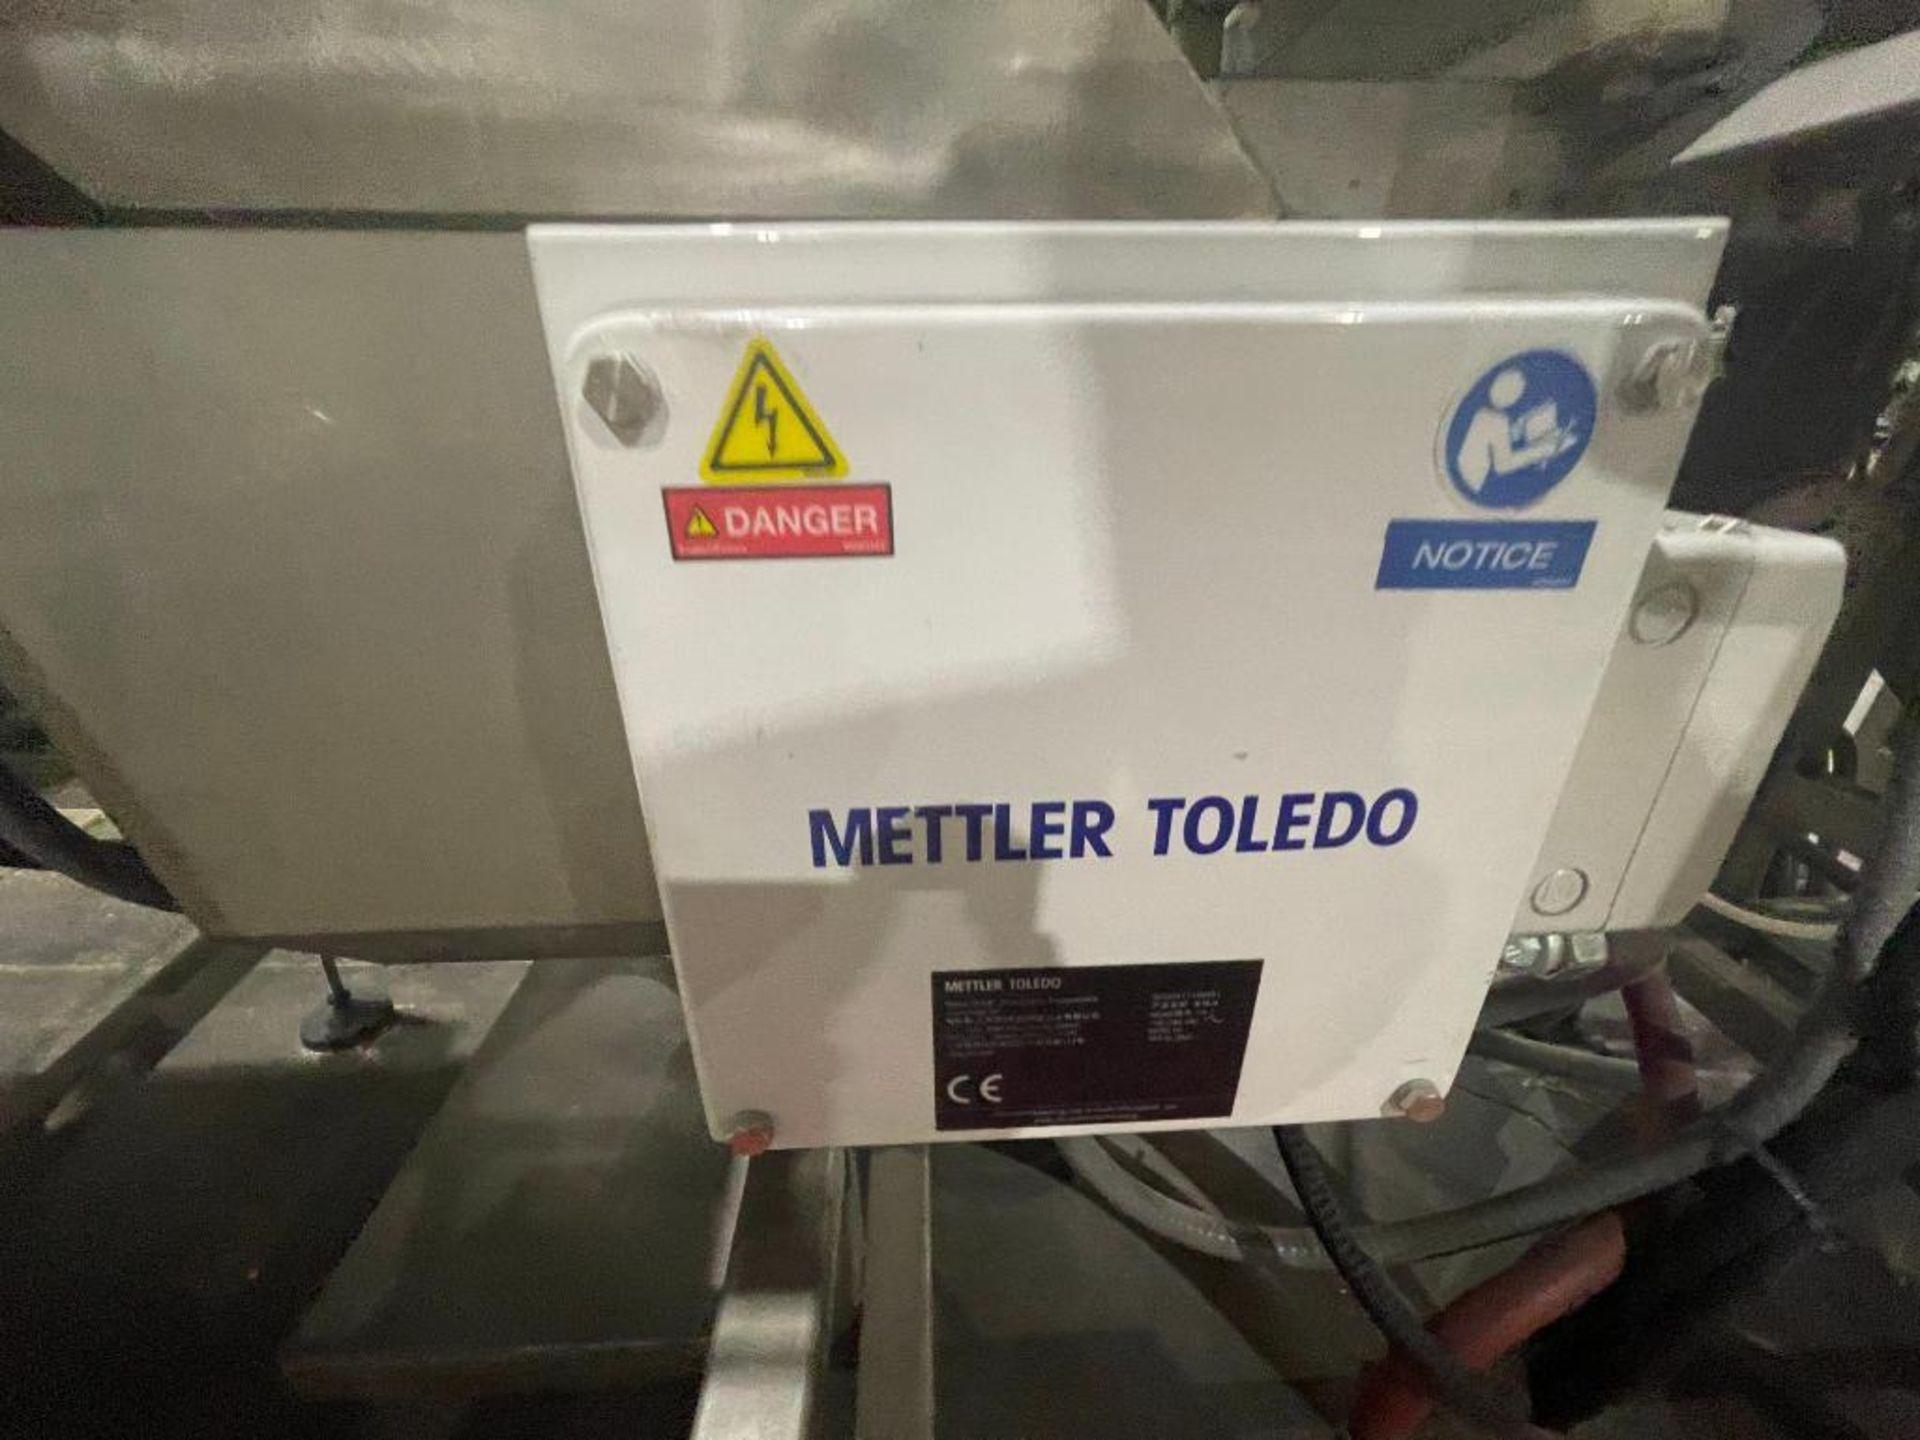 Mettler Toledo metal detector, model V4-1 - Image 4 of 10